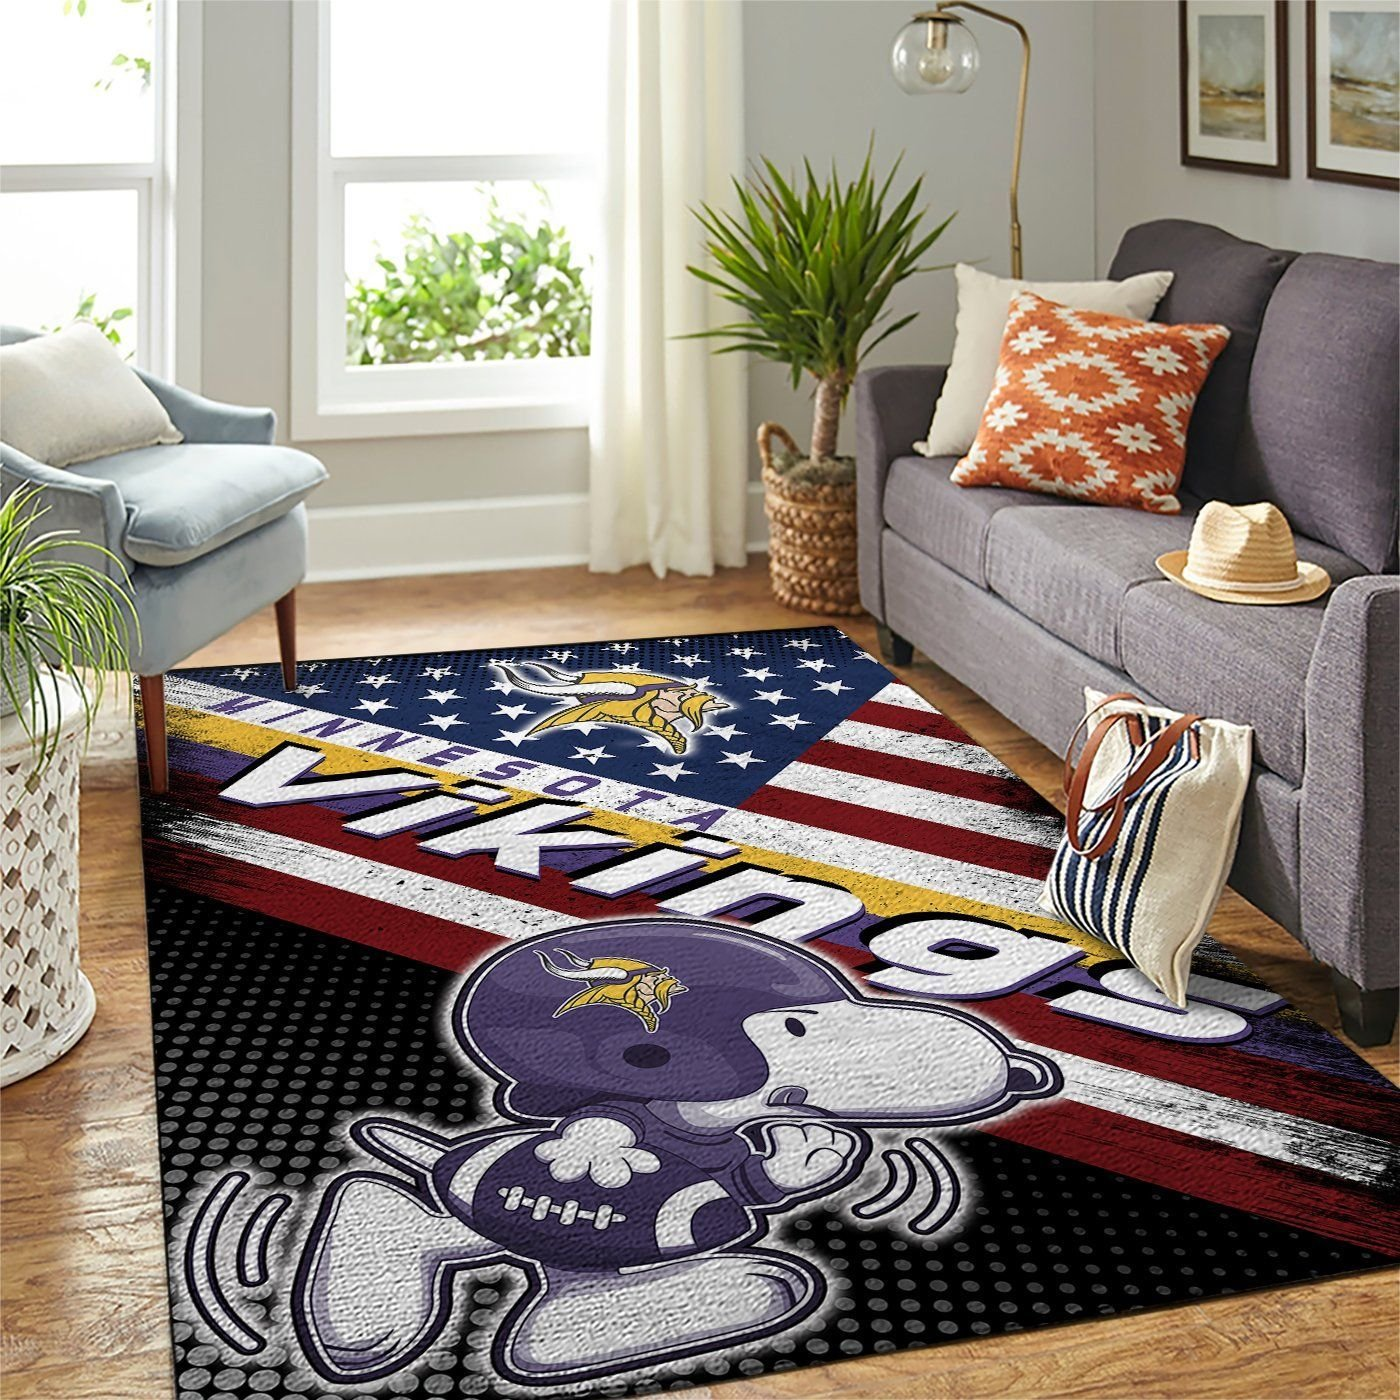 Amazon Minnesota Vikings Living Room Area No3961 Rug